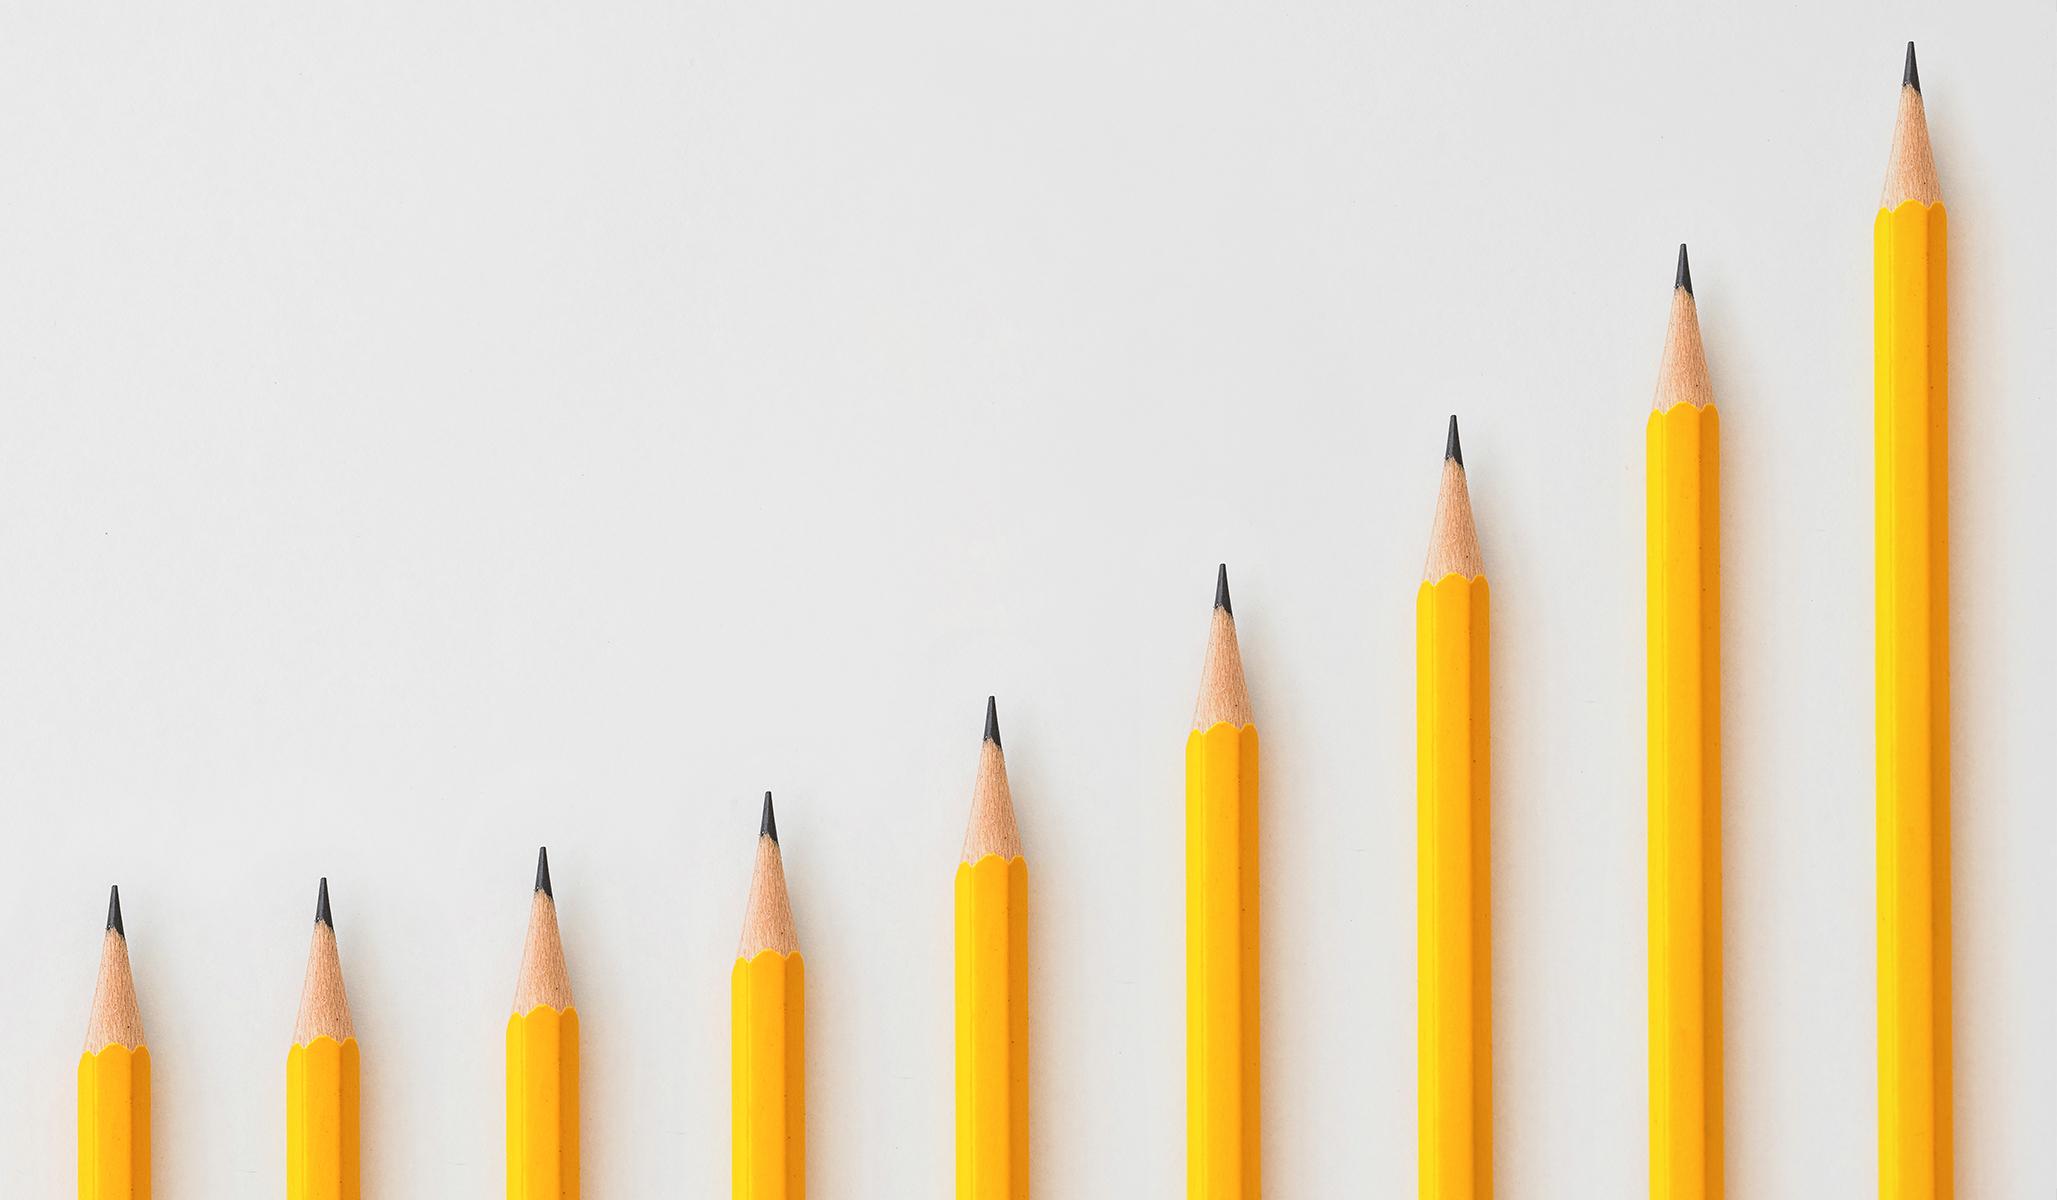 In Defense of 'I, Pencil'